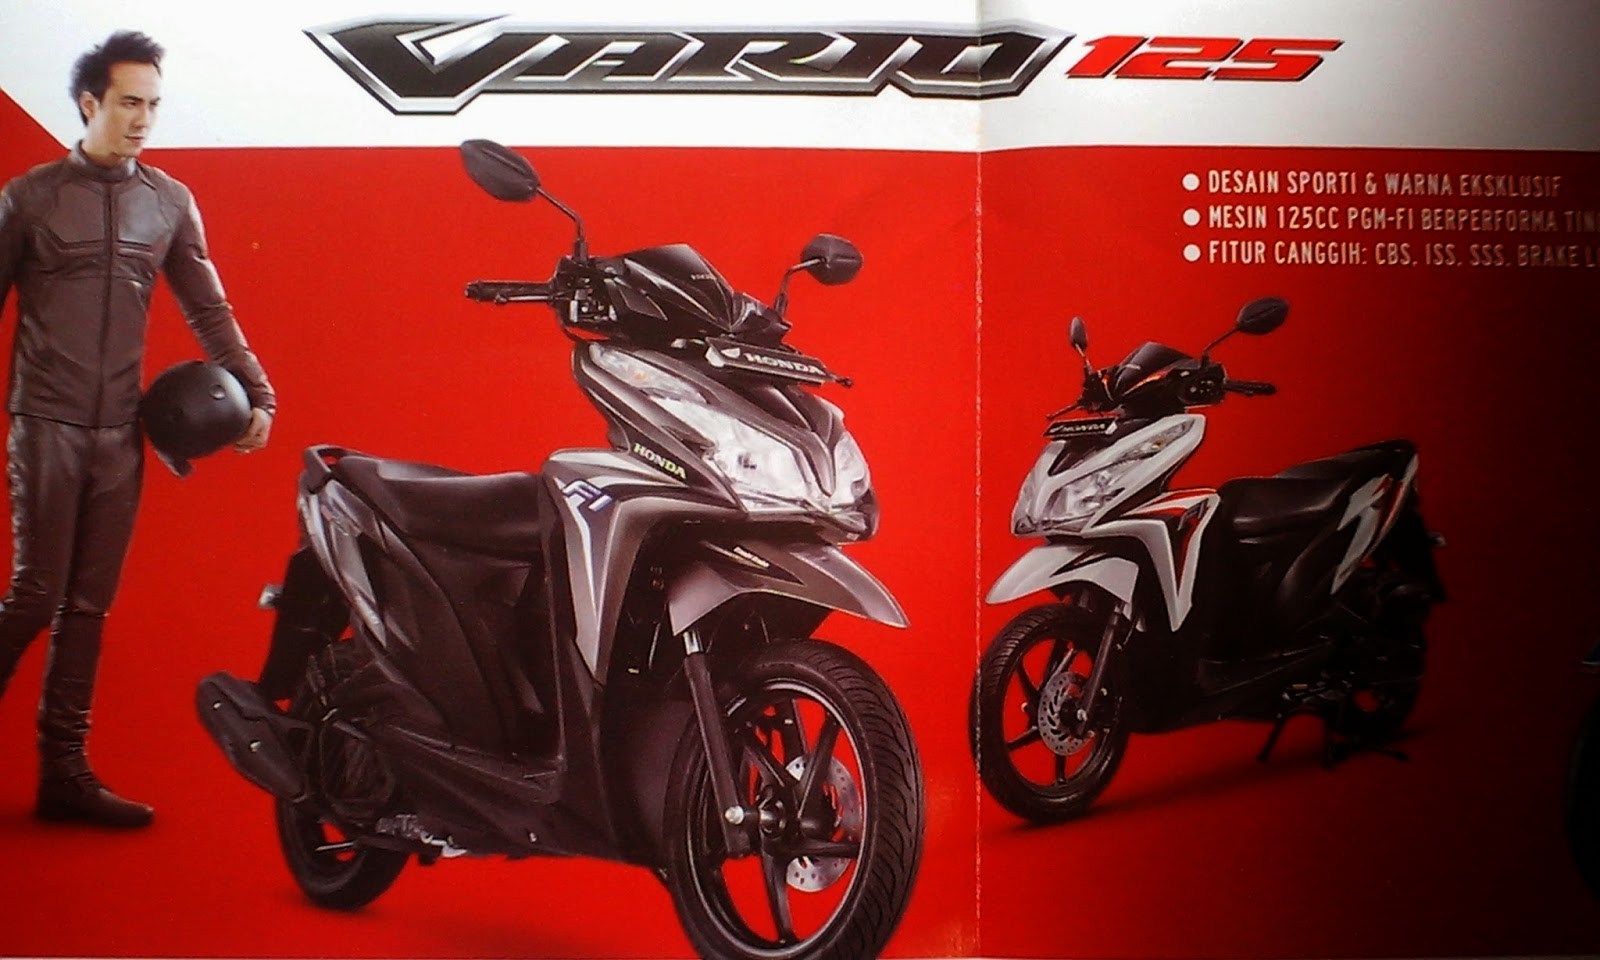 Harga Jual Kredit Honda Vario 150 Fi Motor Paling New 110 Esp Cbs Glam Red Yogyakarta Cash Amp Techno 125 Dan Iss